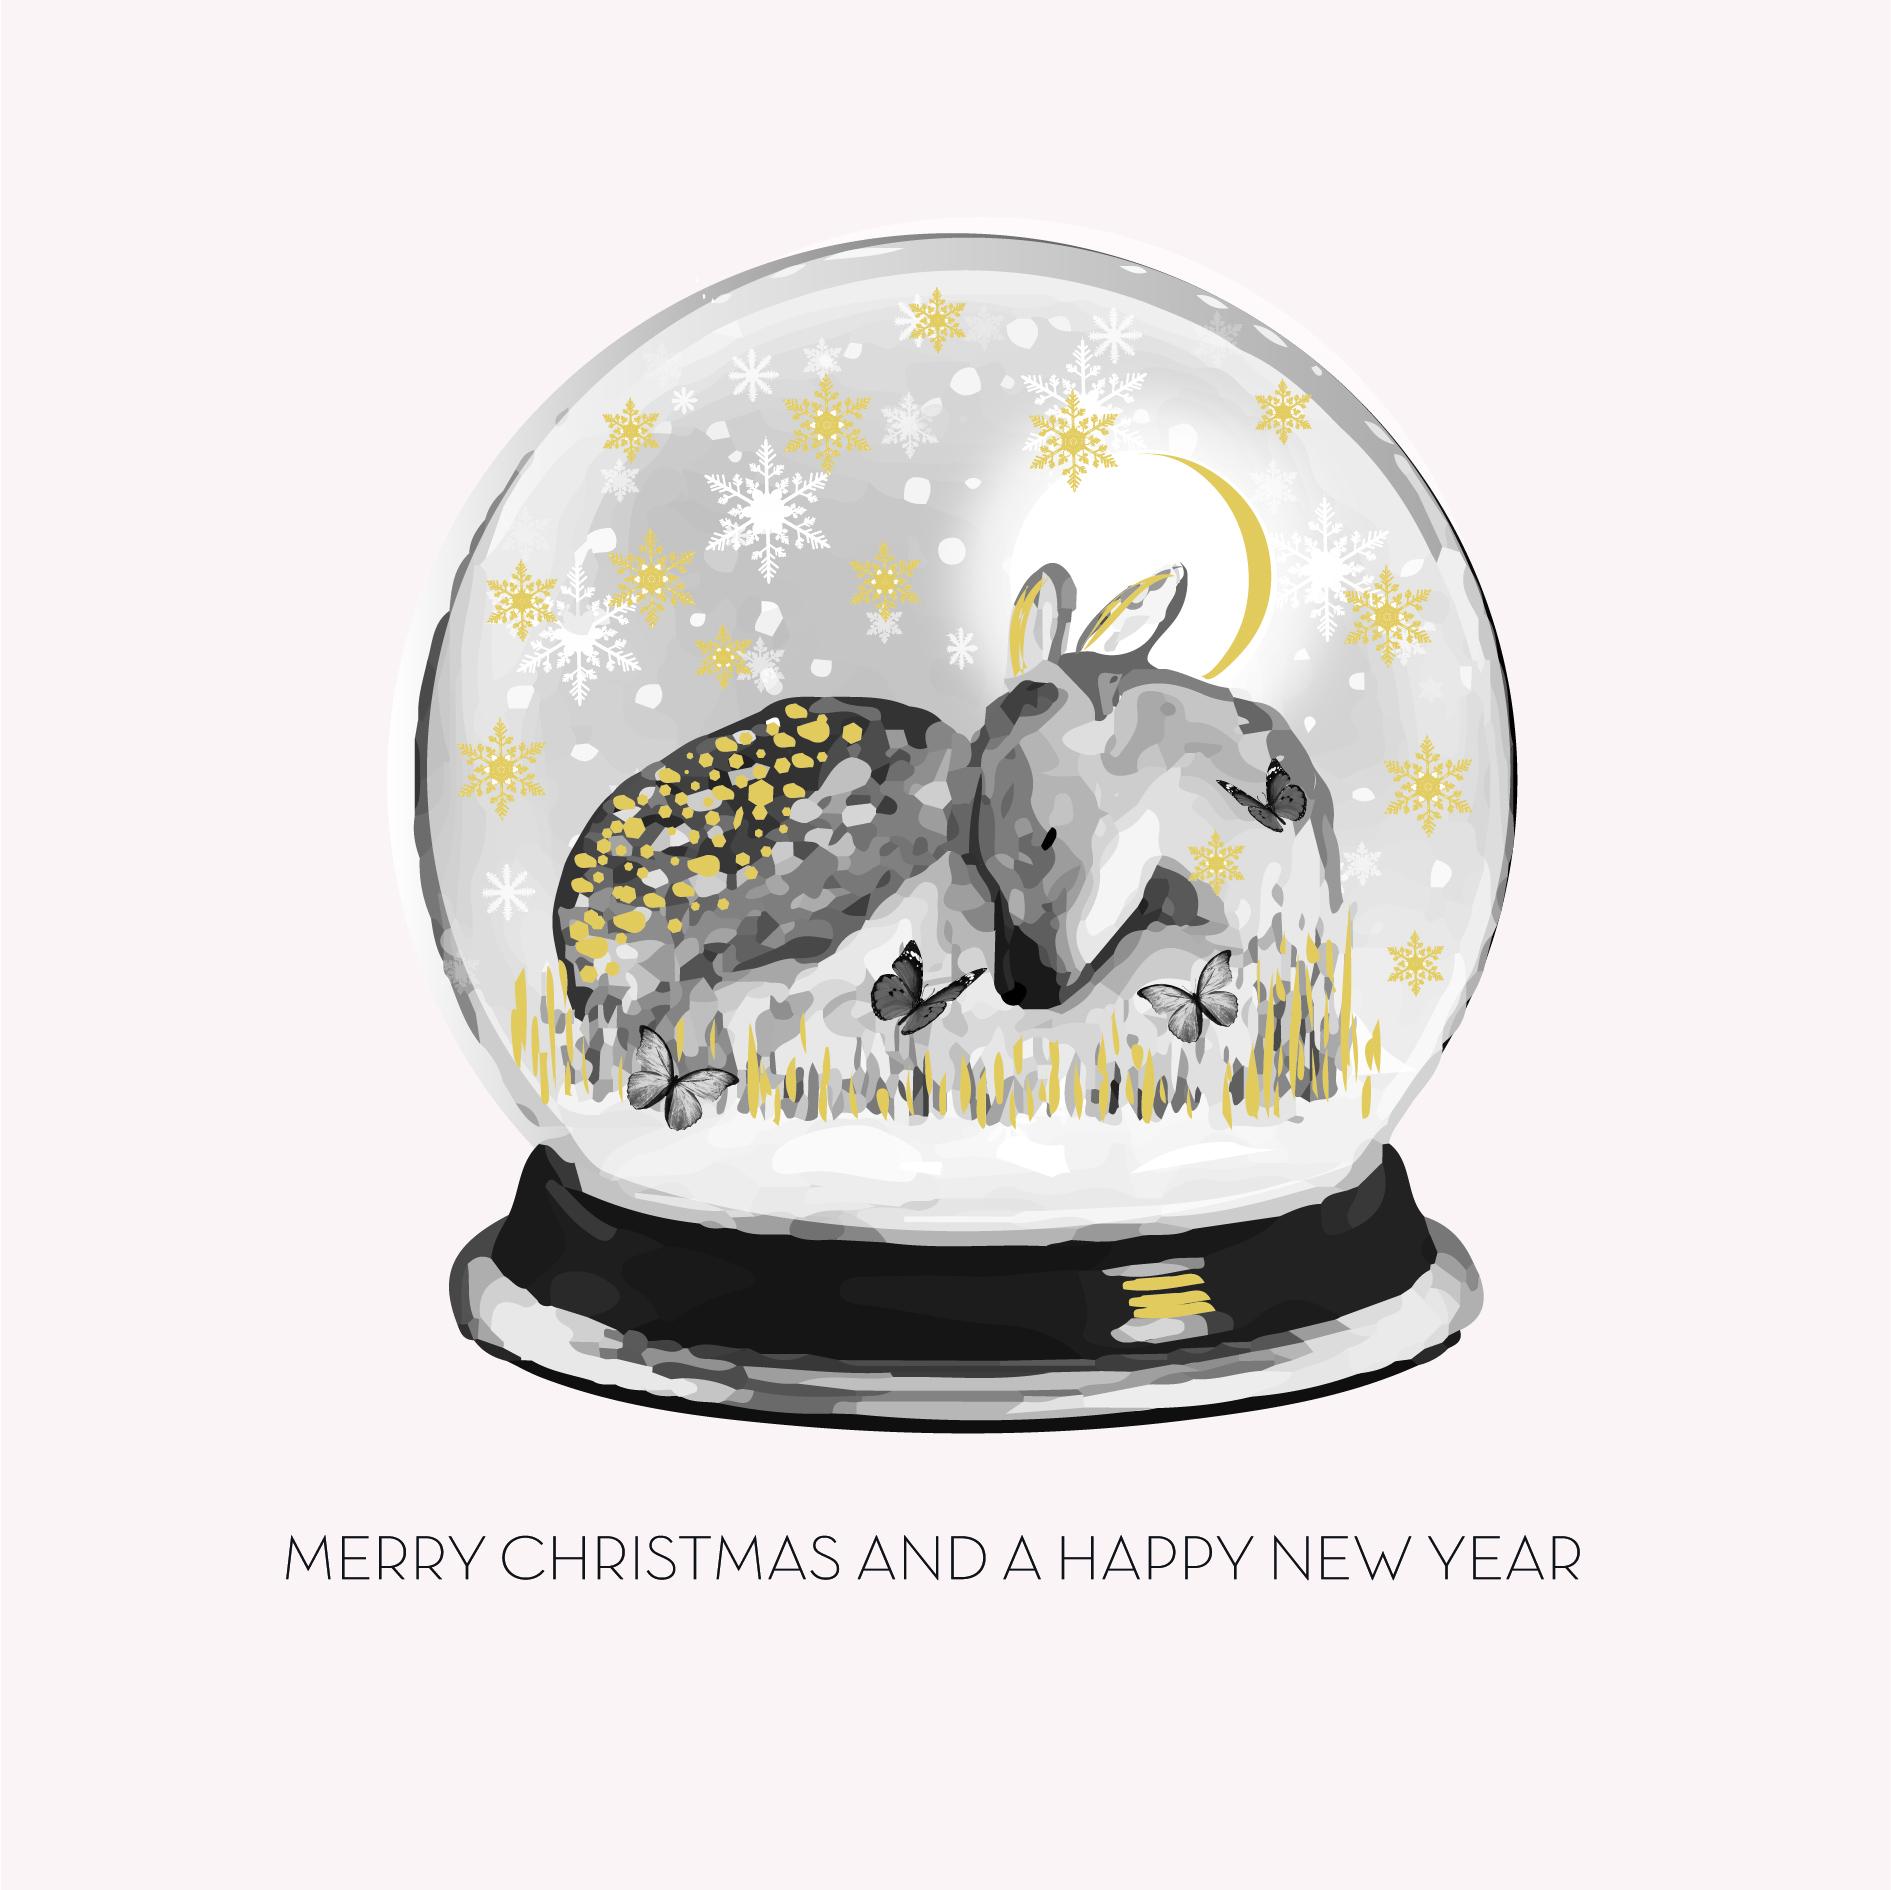 Box of 6 Christmas Globe Cards